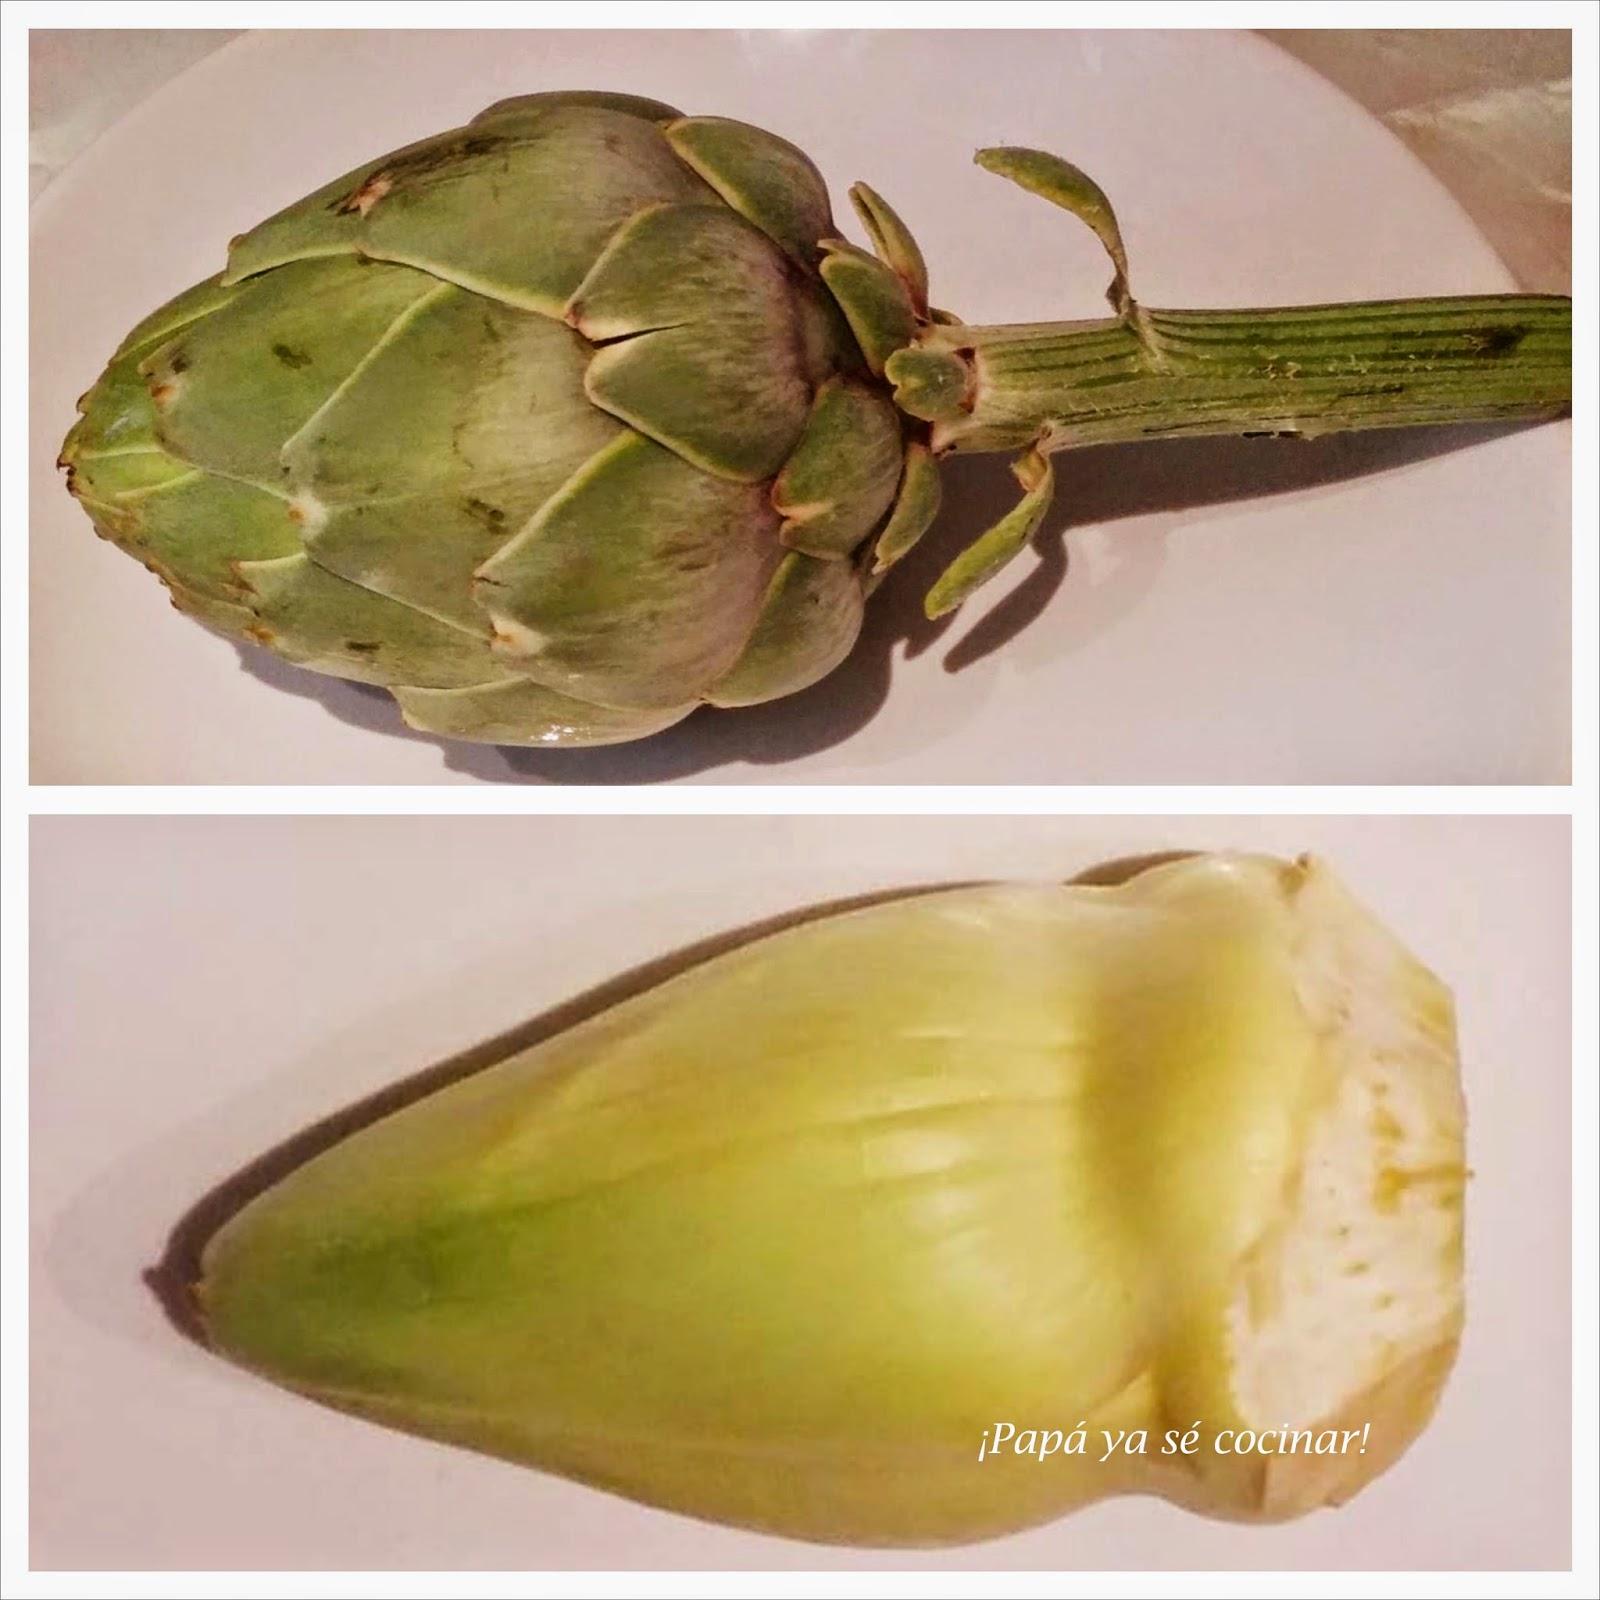 Pap ya s cocinar alcachofas rehogadas con jam n for Cocinar alcachofas